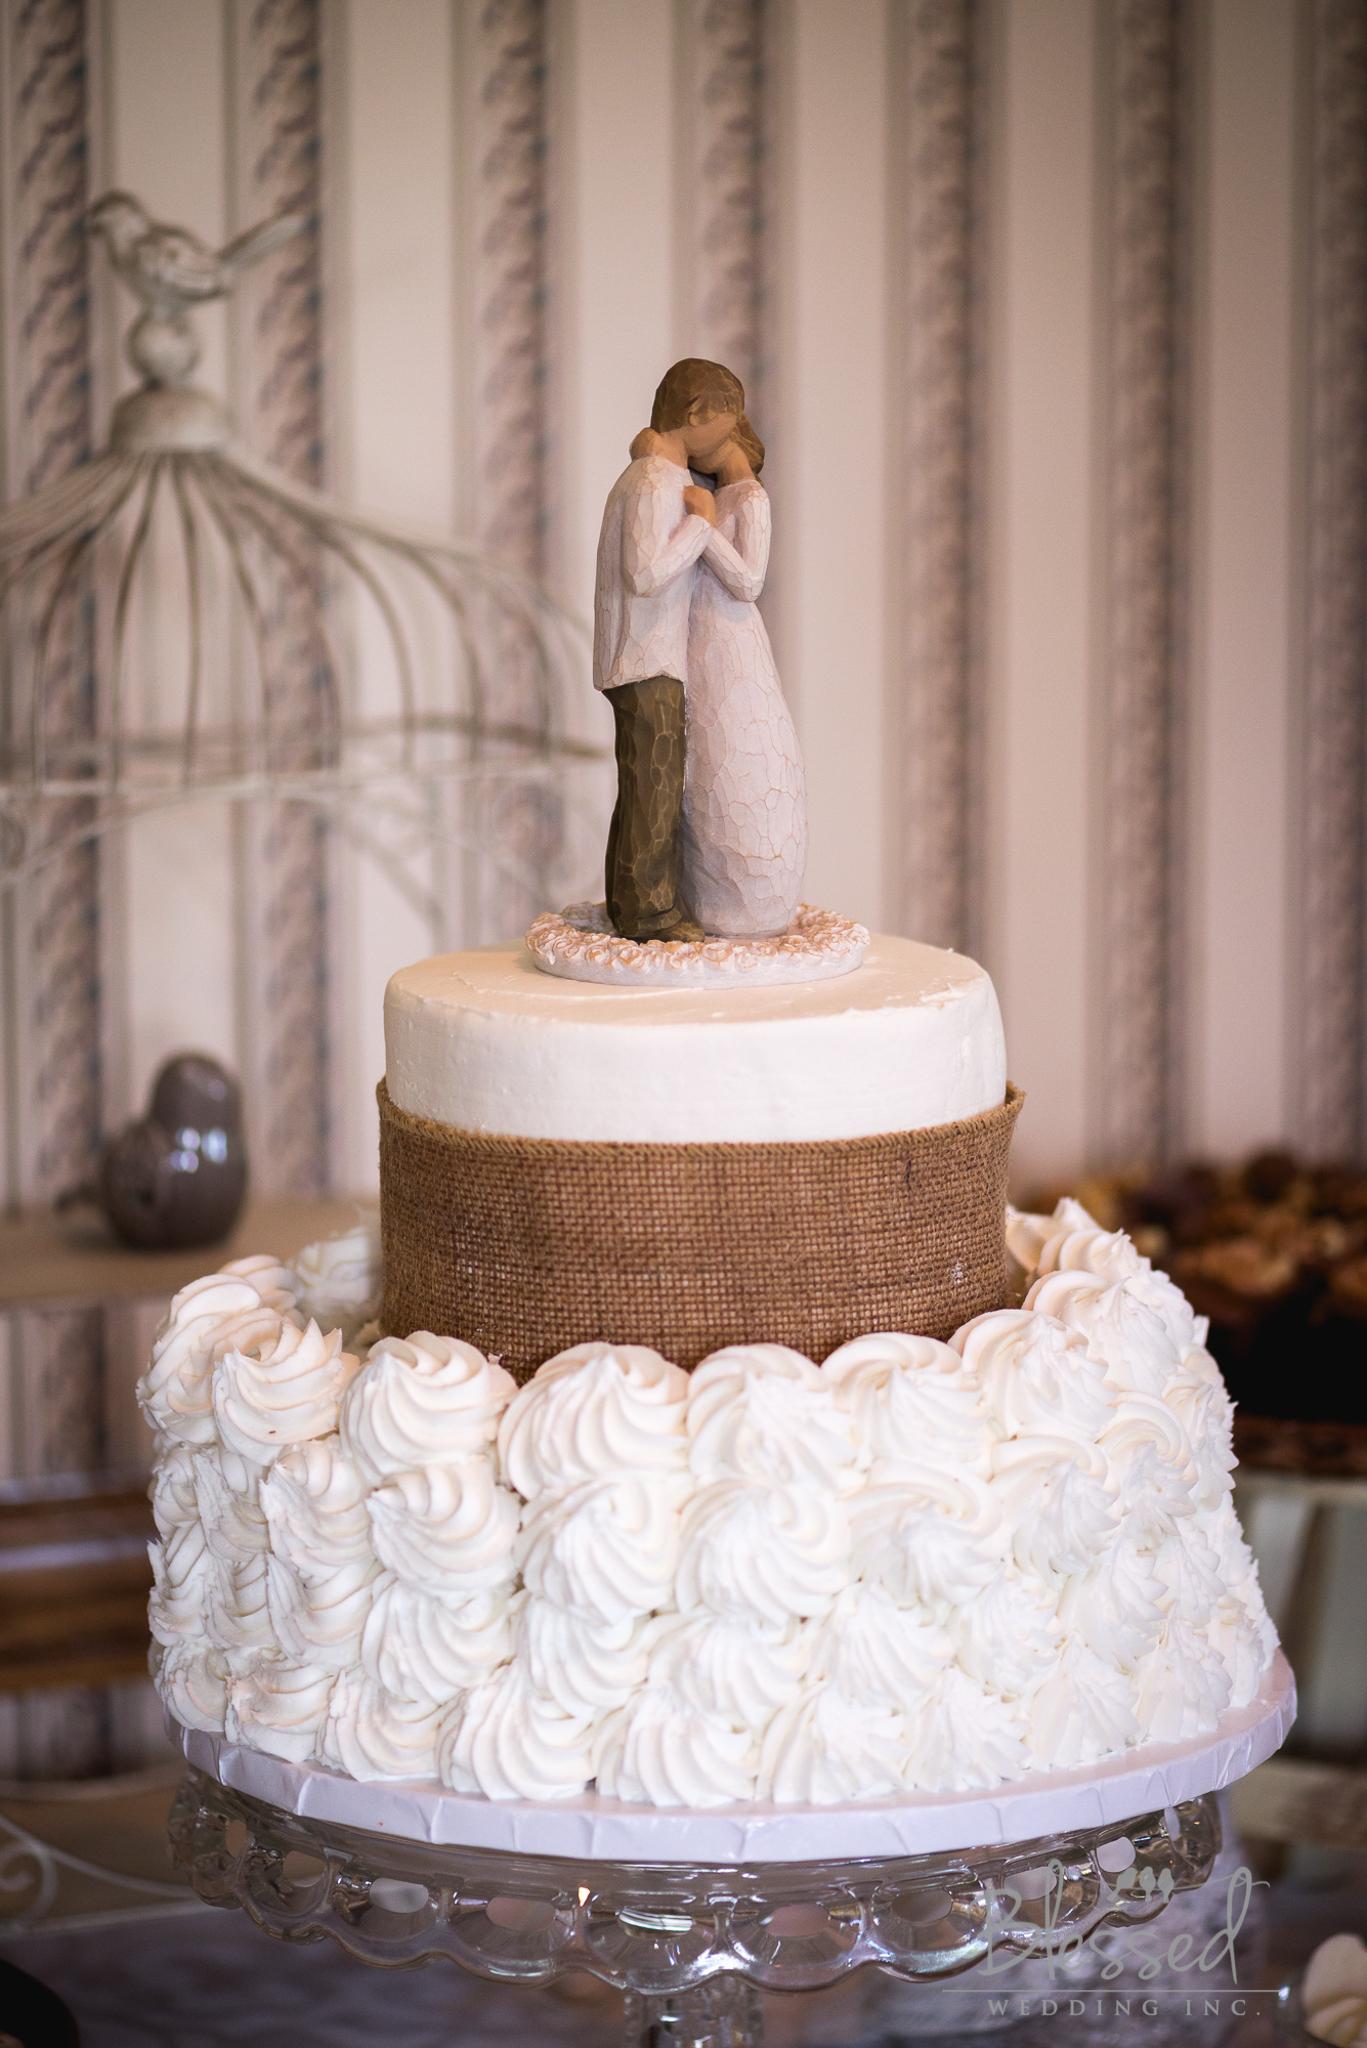 Destination Wedding Photography Minnesota By Blessed Wedding Photographers-70.jpg